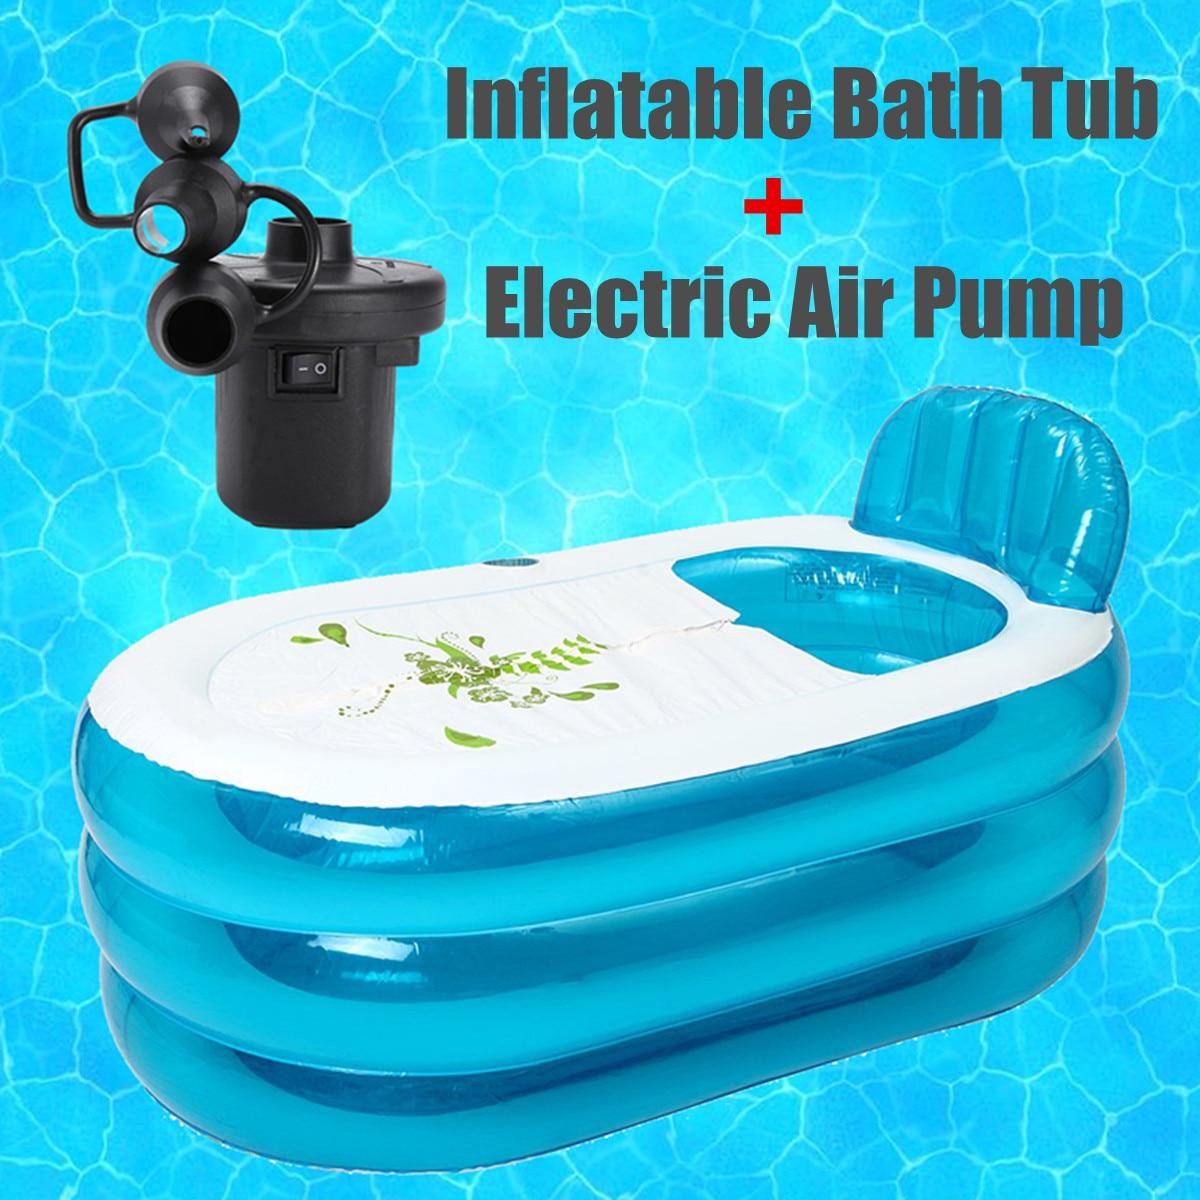 1Set 140x75x70cm PVC Folding Portable <font><b>Bathtub</b></font> for Adults Inflatable Bath Enjoy life <font><b>Bathtub</b></font> with Inflatable and deflation Pump